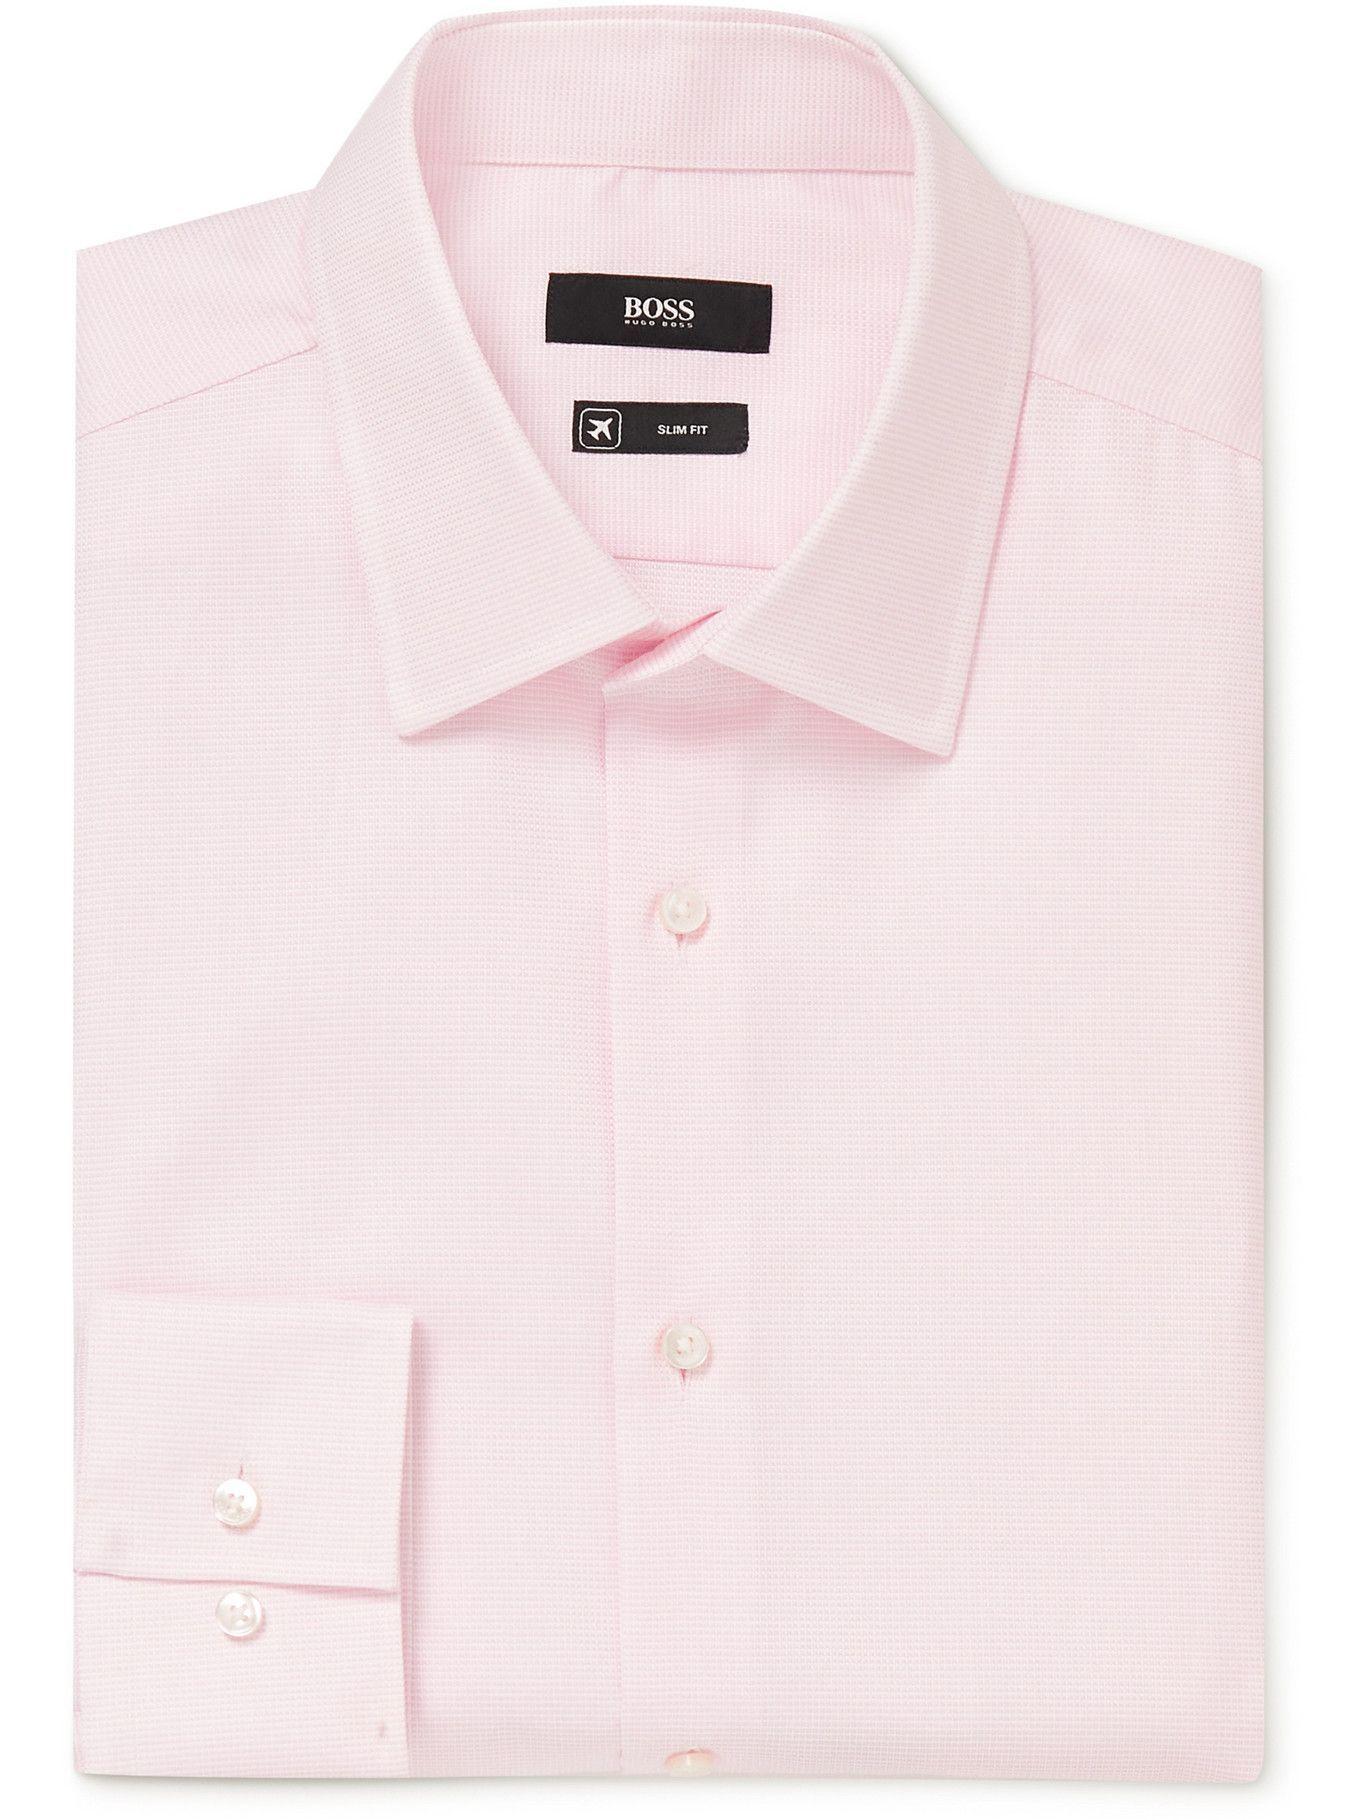 HUGO BOSS - Jango Slim-Fit Cotton-Piqué Shirt - Pink